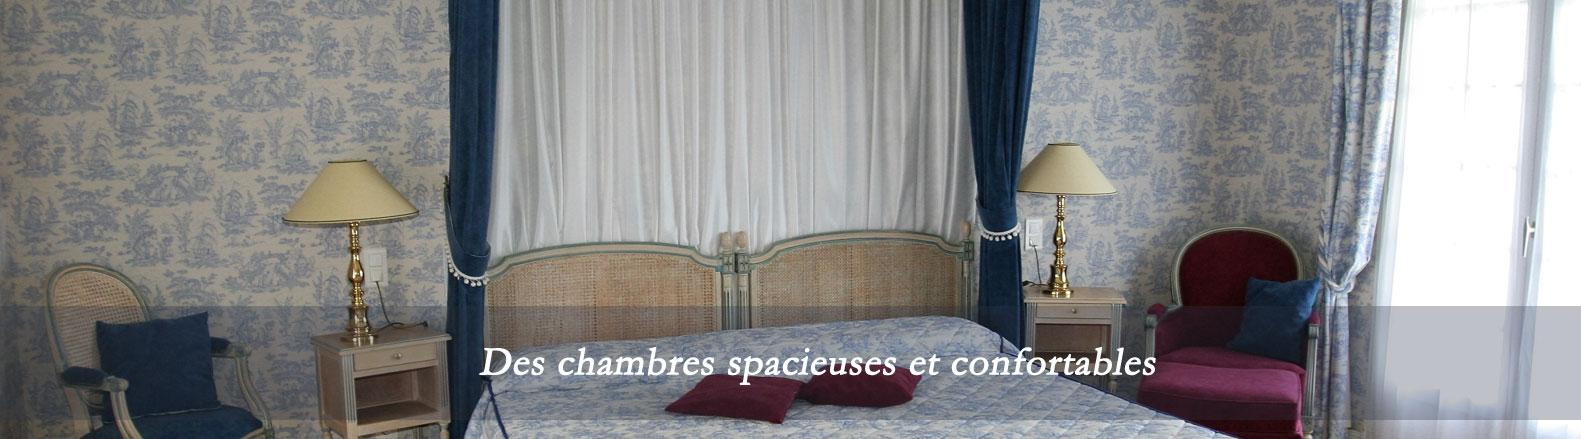 hotel-treport-06-2